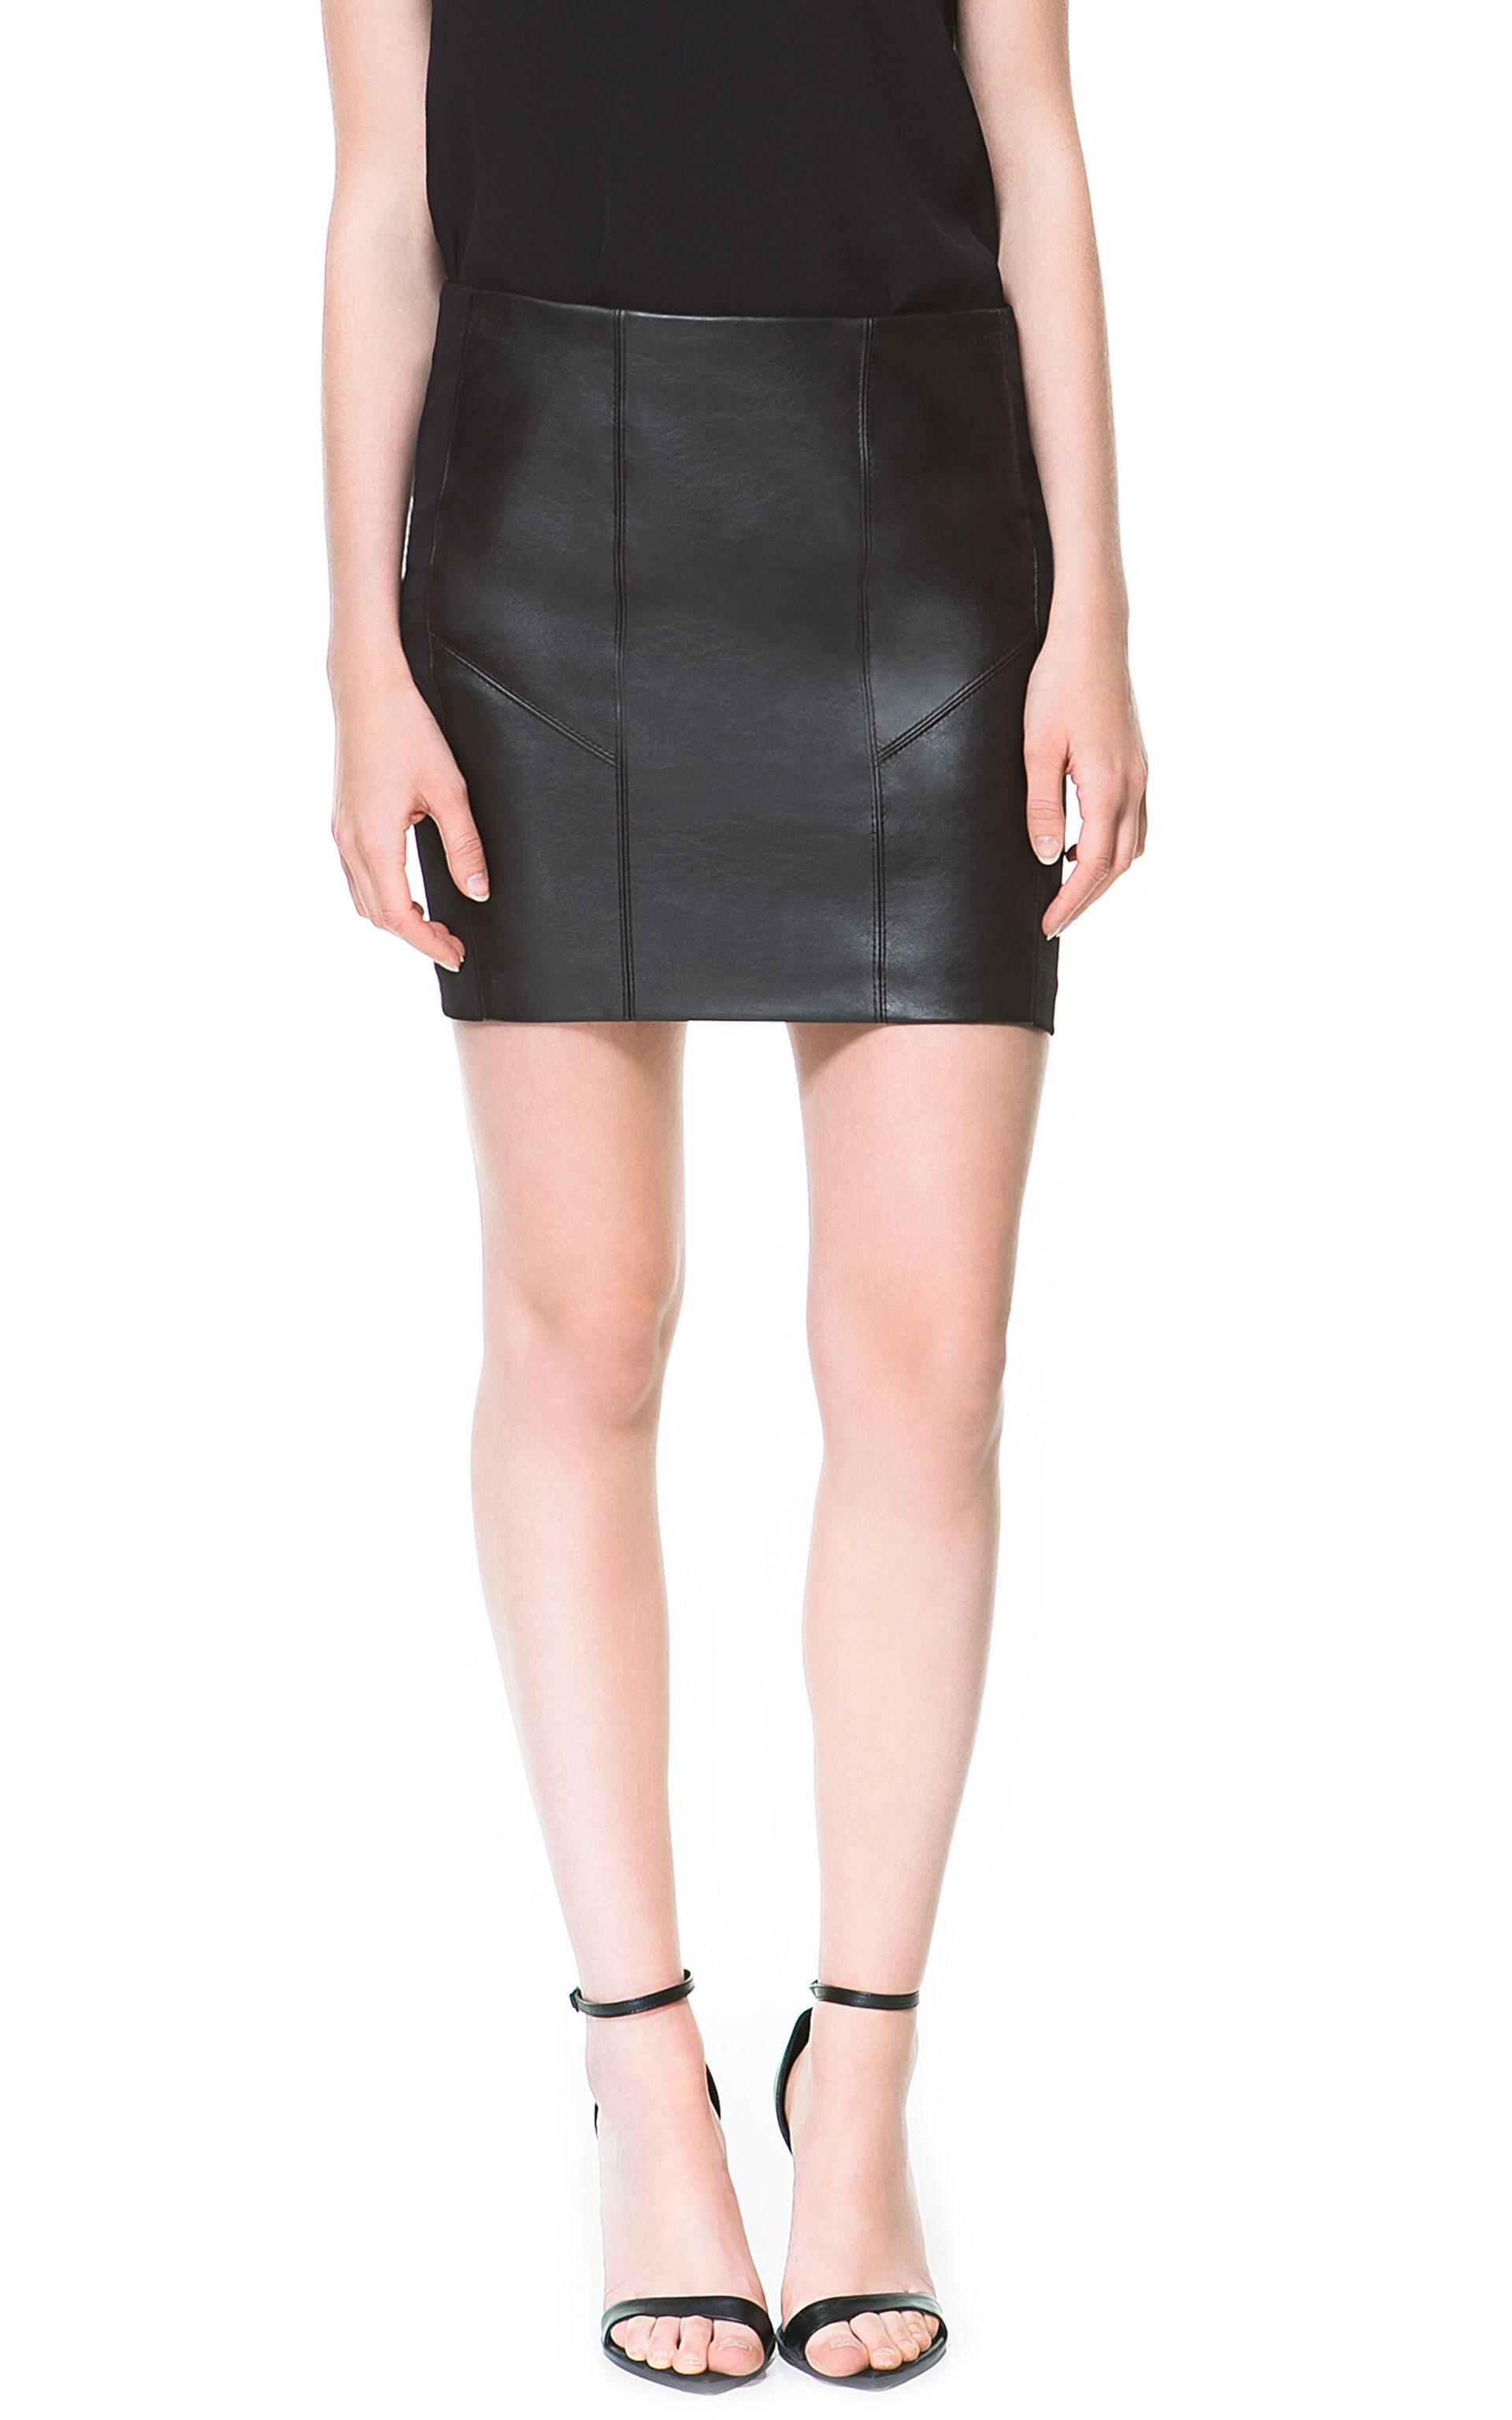 446a0591 Black Faux Leather Skirt Zara - raveitsafe